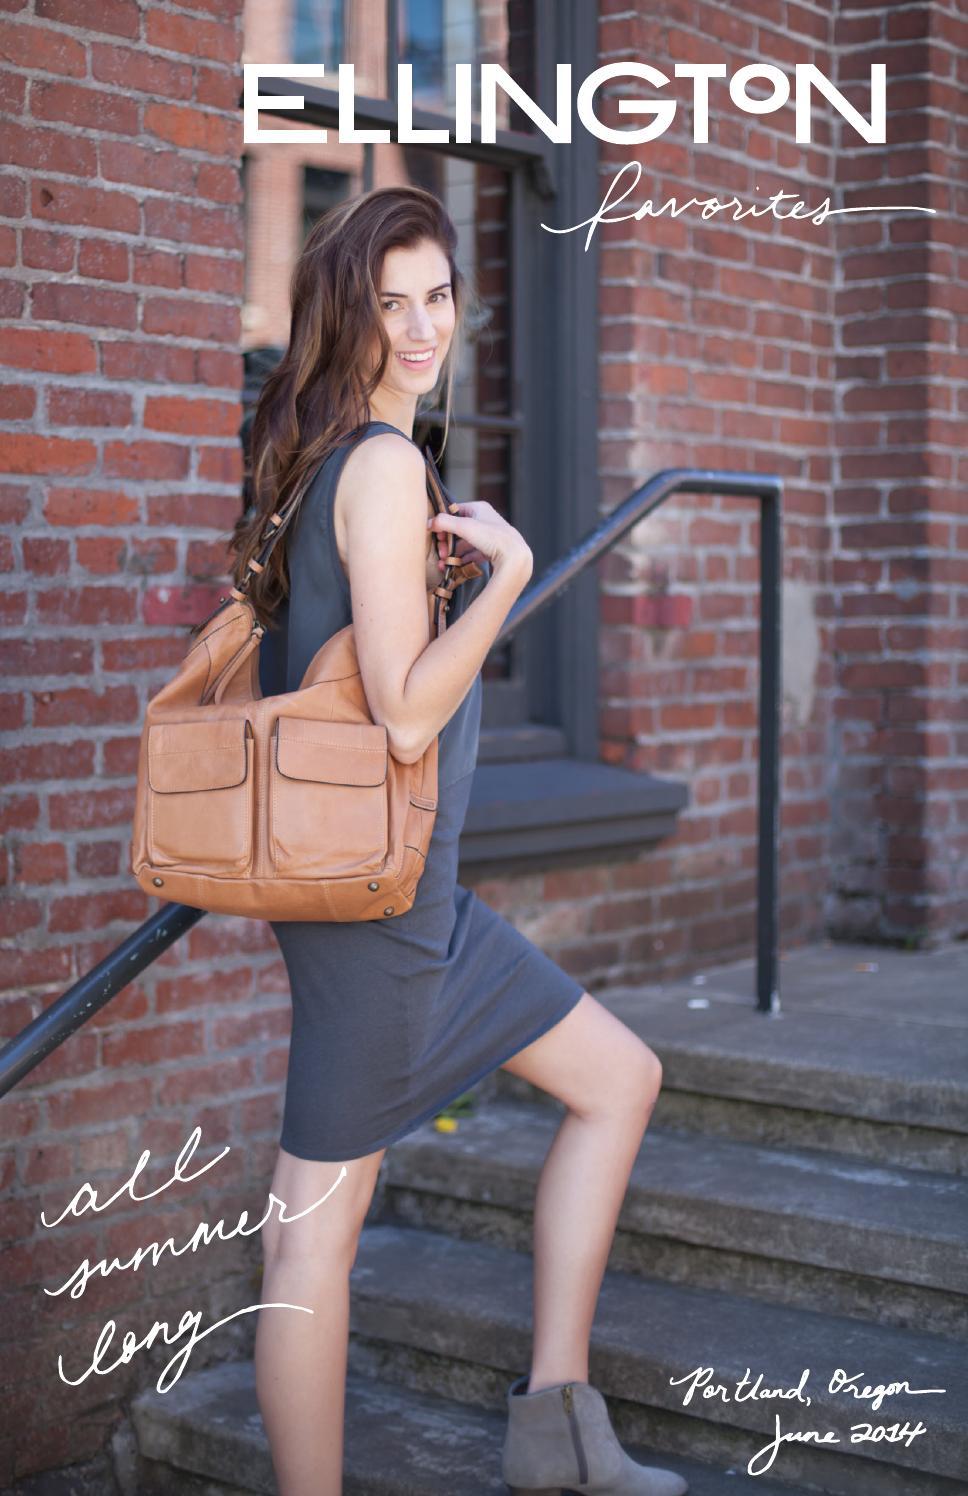 Ellington Handbags Summer Lookbook